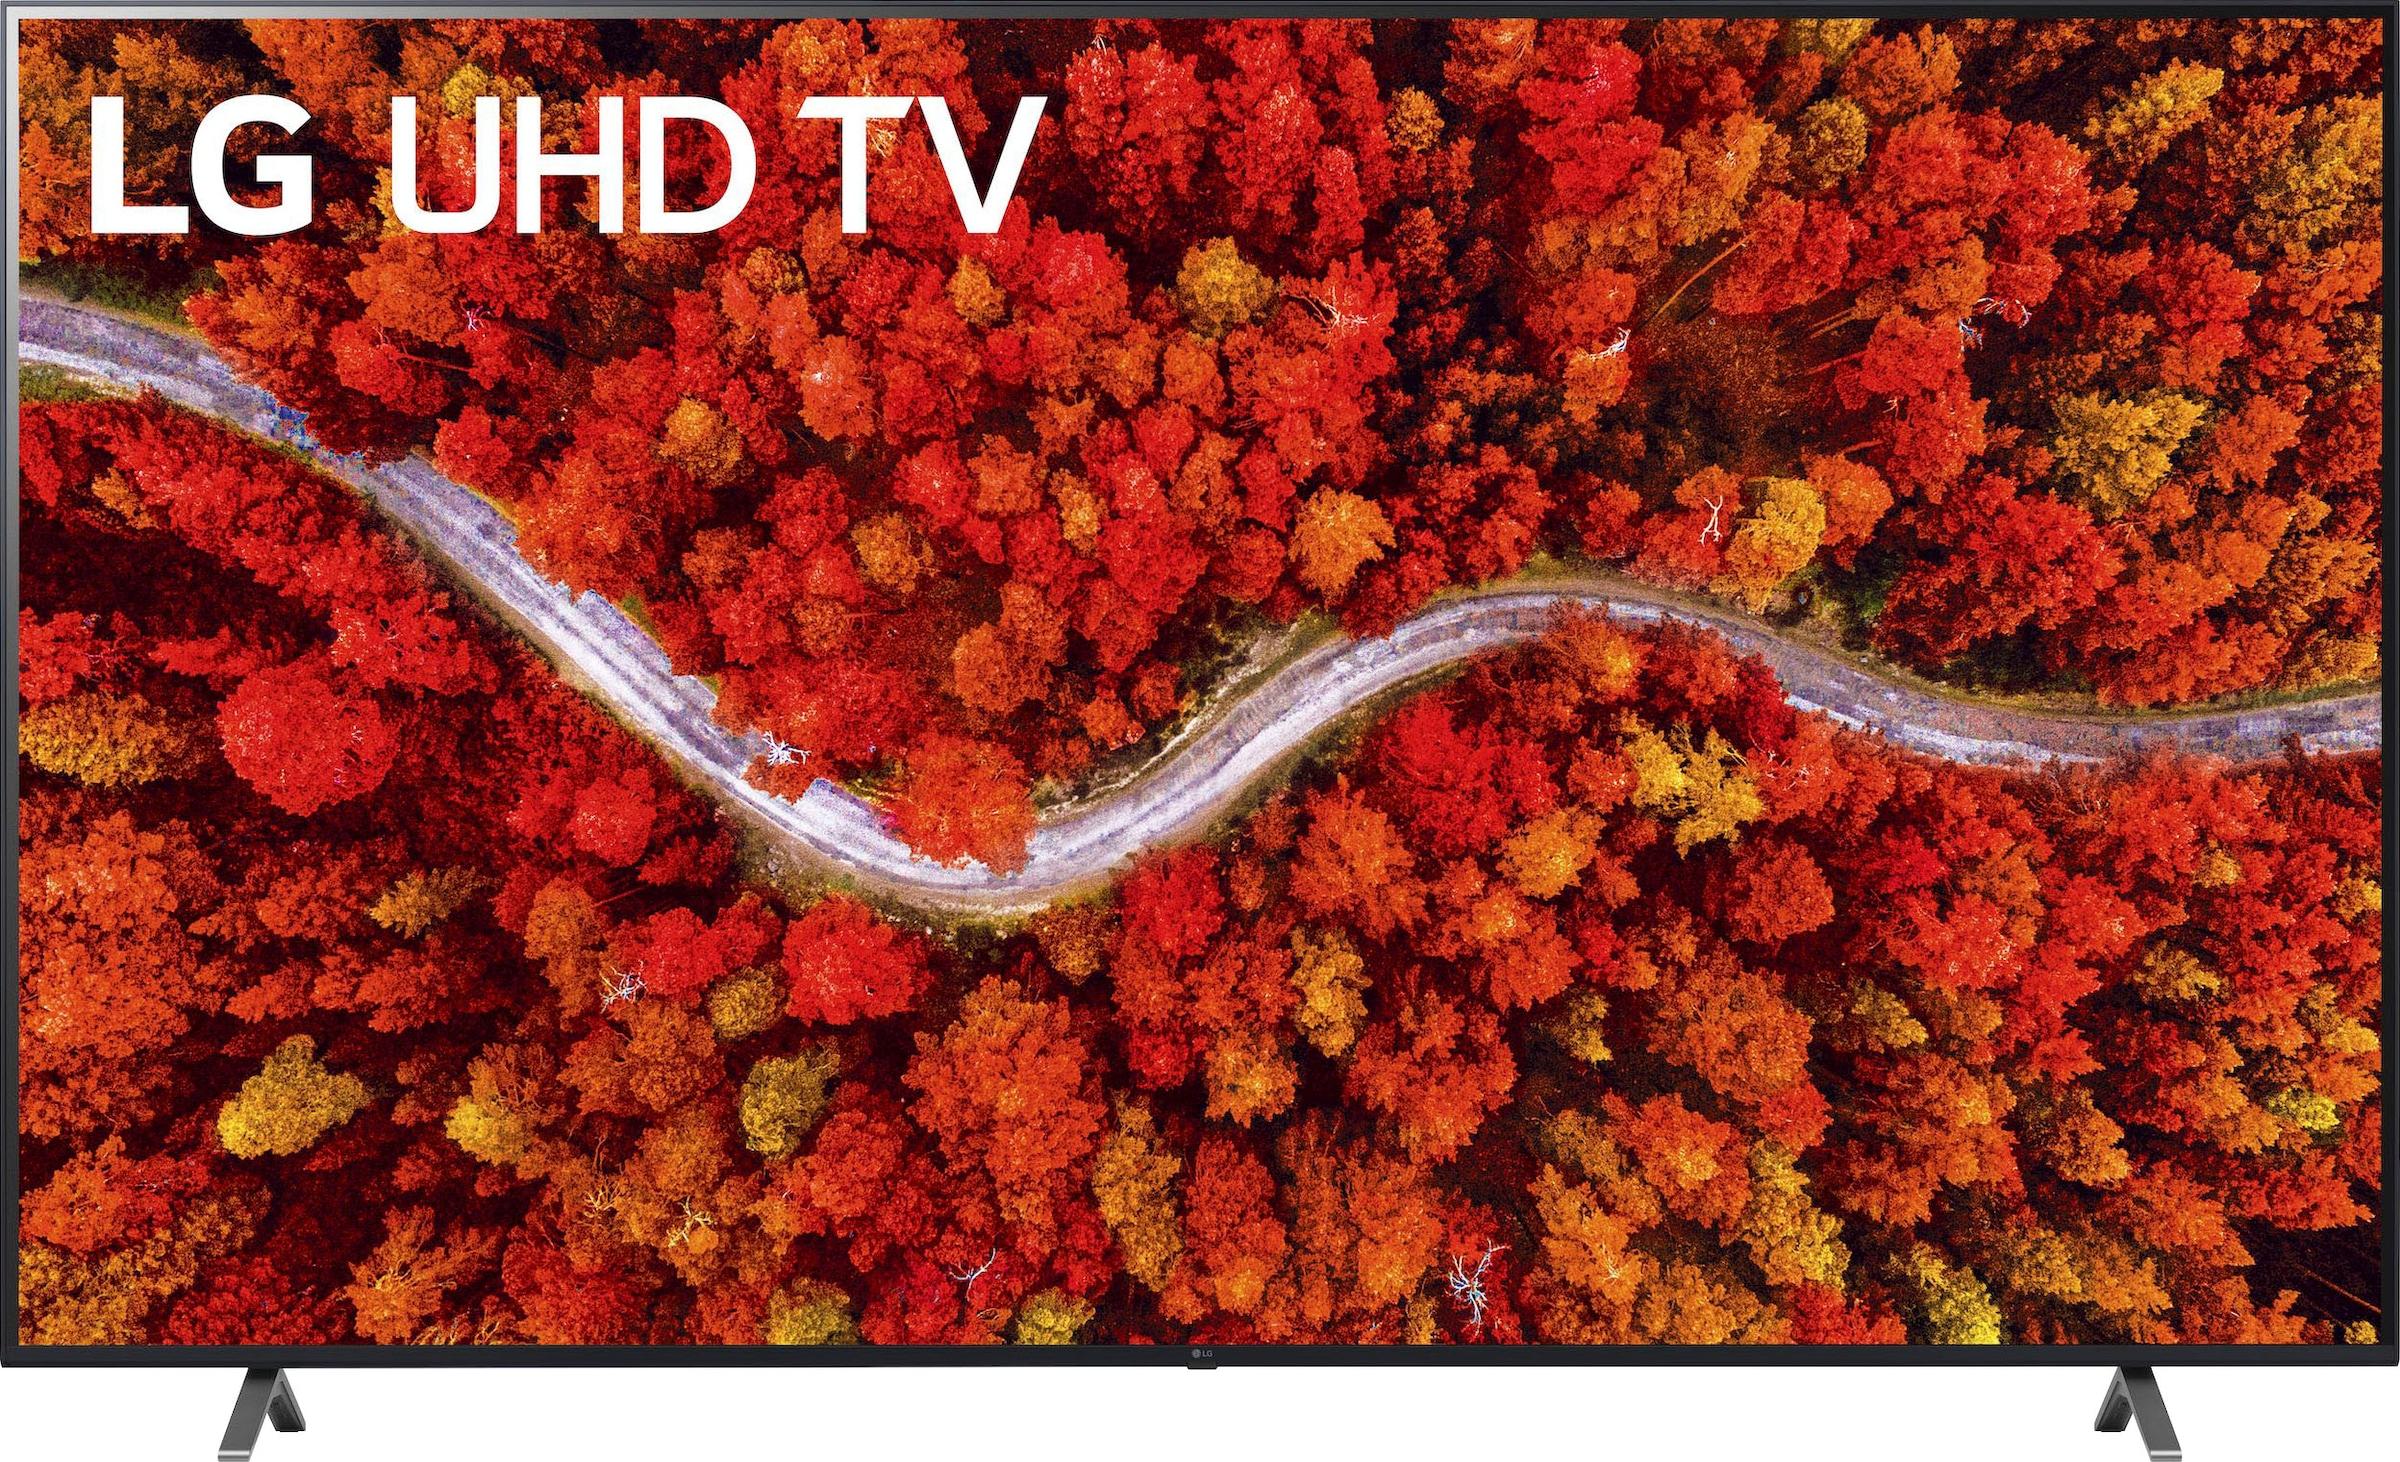 LG LCD-LED Fernseher 86UP80009LA , 217 cm 86 , 4K Ultra HD, Smart-TV, bis zu 120Hz -LG Local Contrast-α7 Gen4 4K AI-Prozessor-Sprachassistenten-Dolby Vision IQ-Dolby Atmos